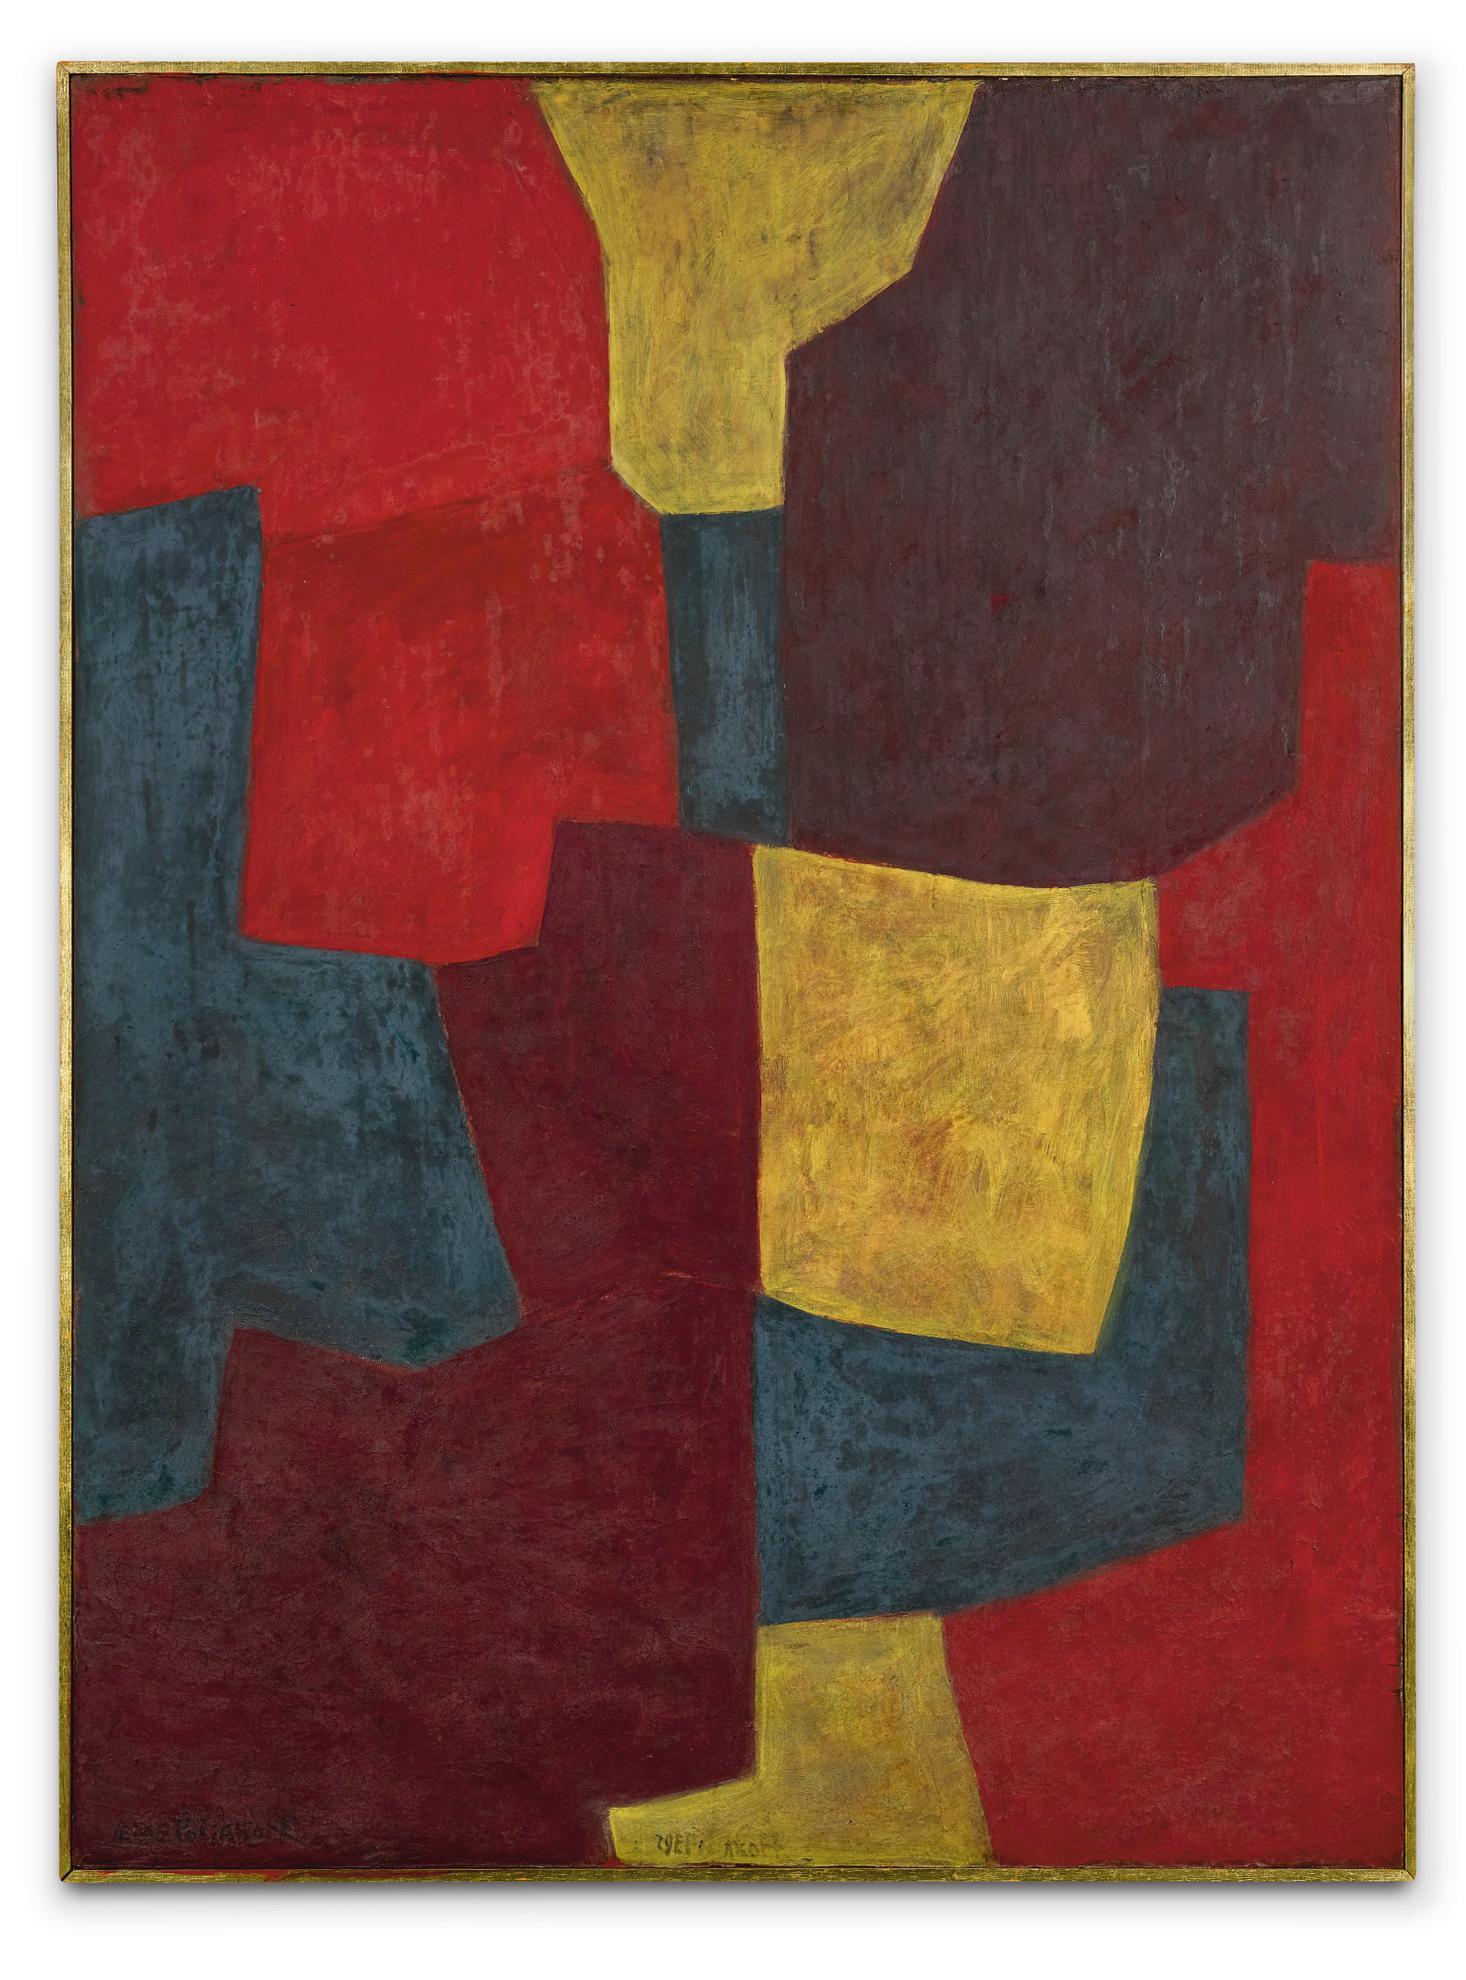 Serge Poliakoff-Composition Abstraite Vert, Rouge, Jaune-1964